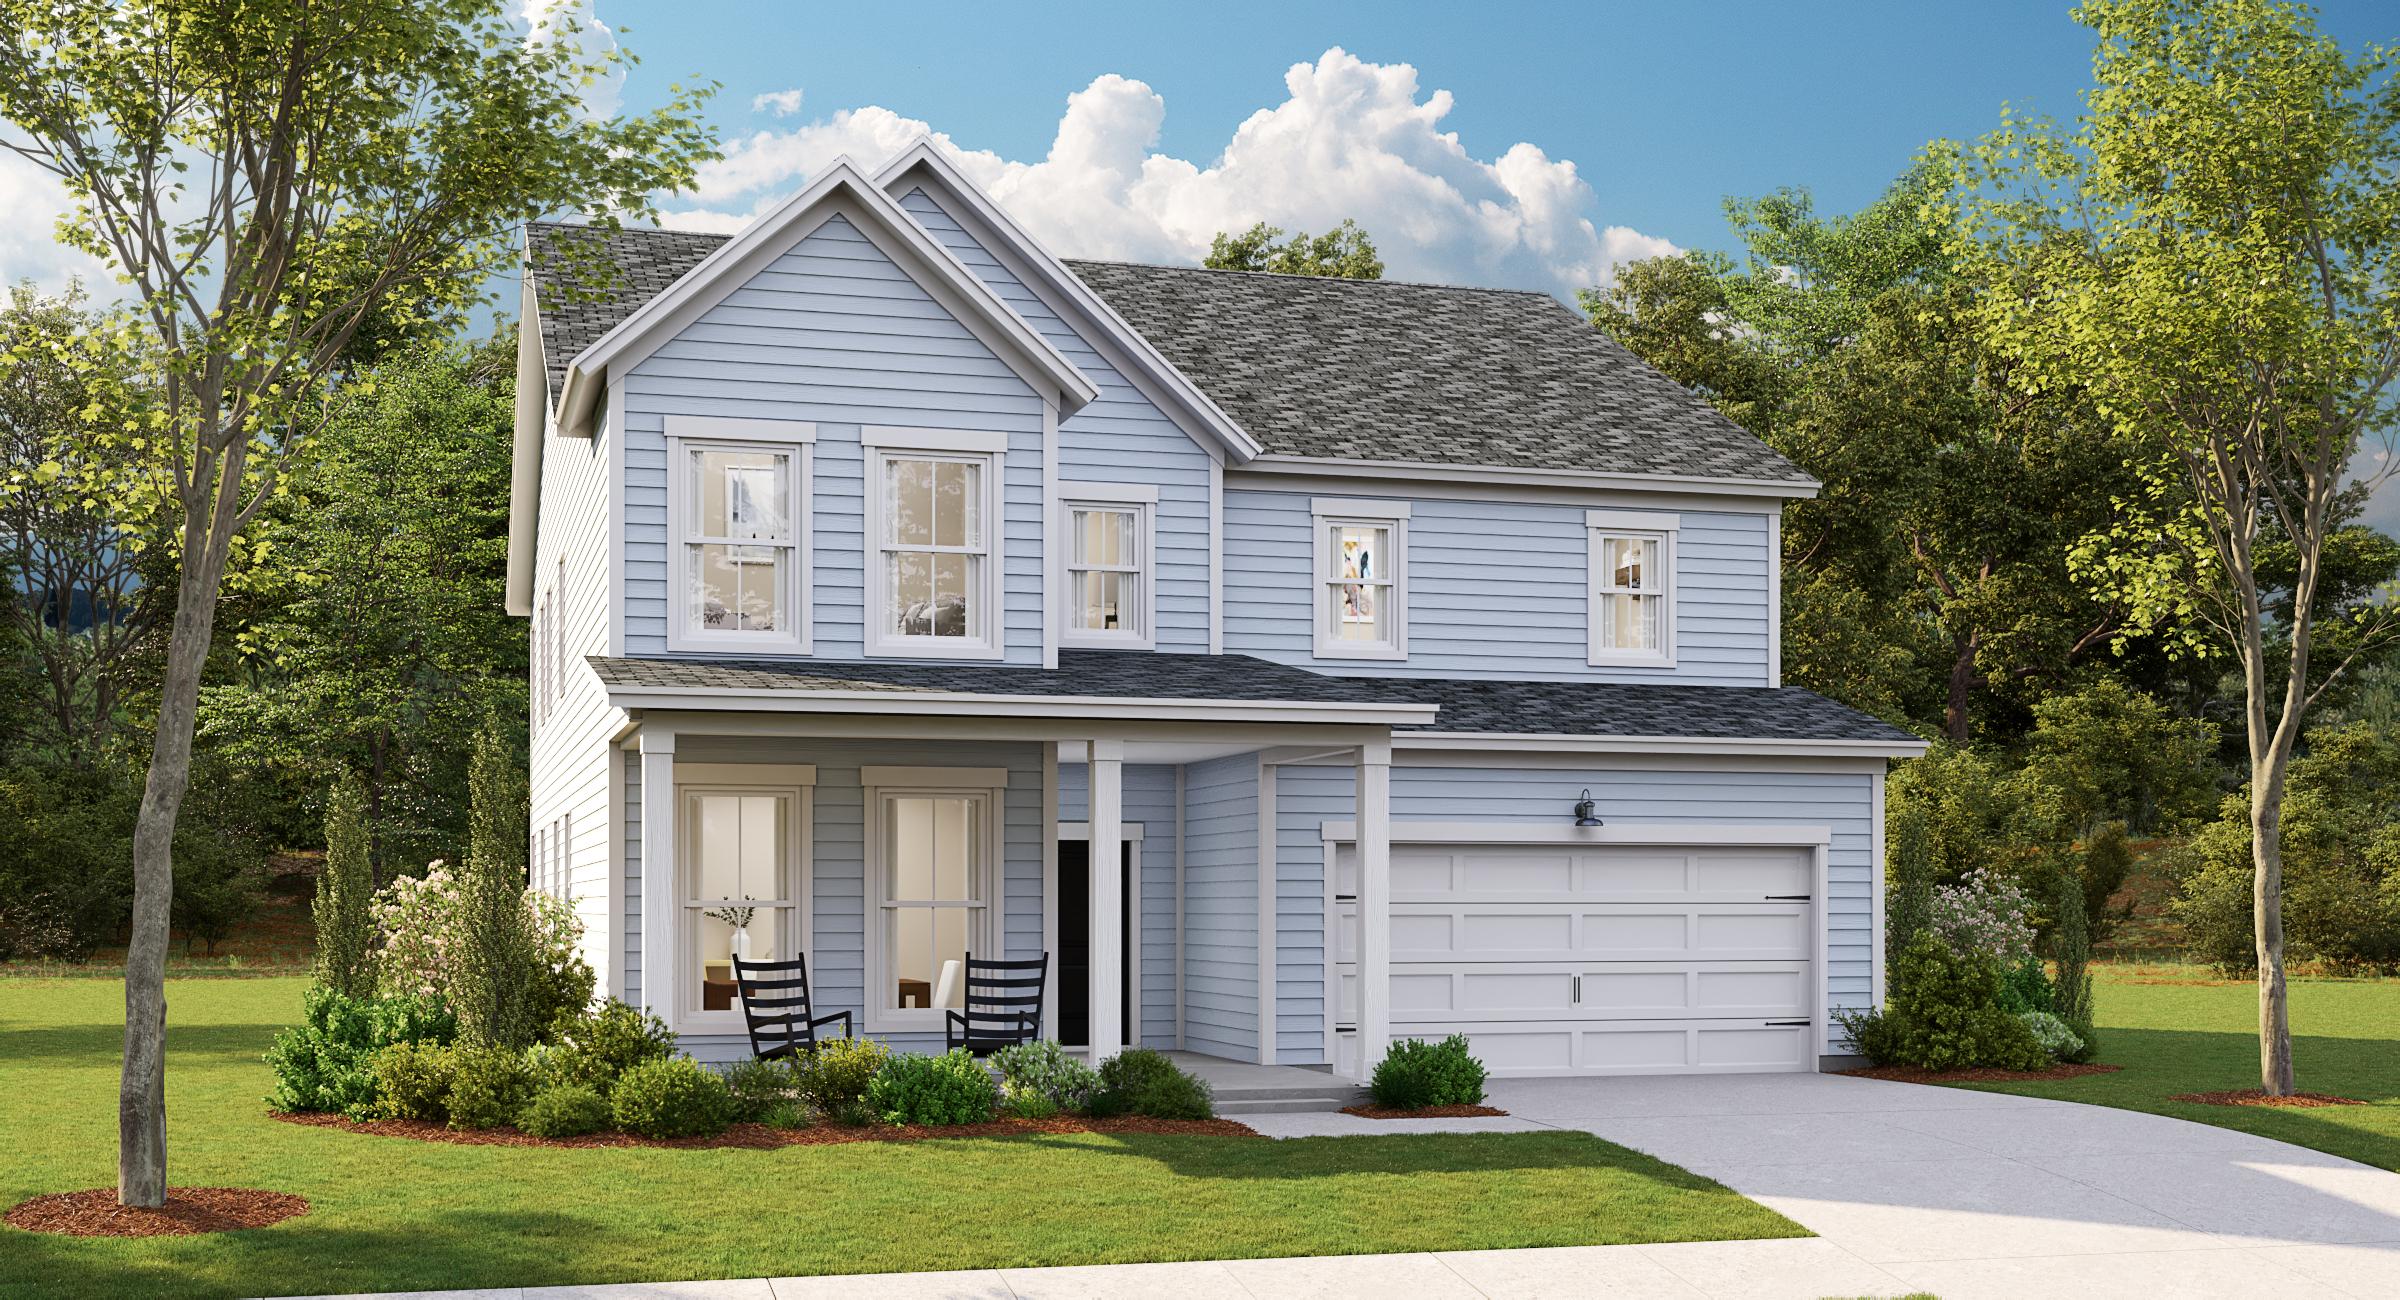 Jasper by Lennar, New Homes in South Carolina